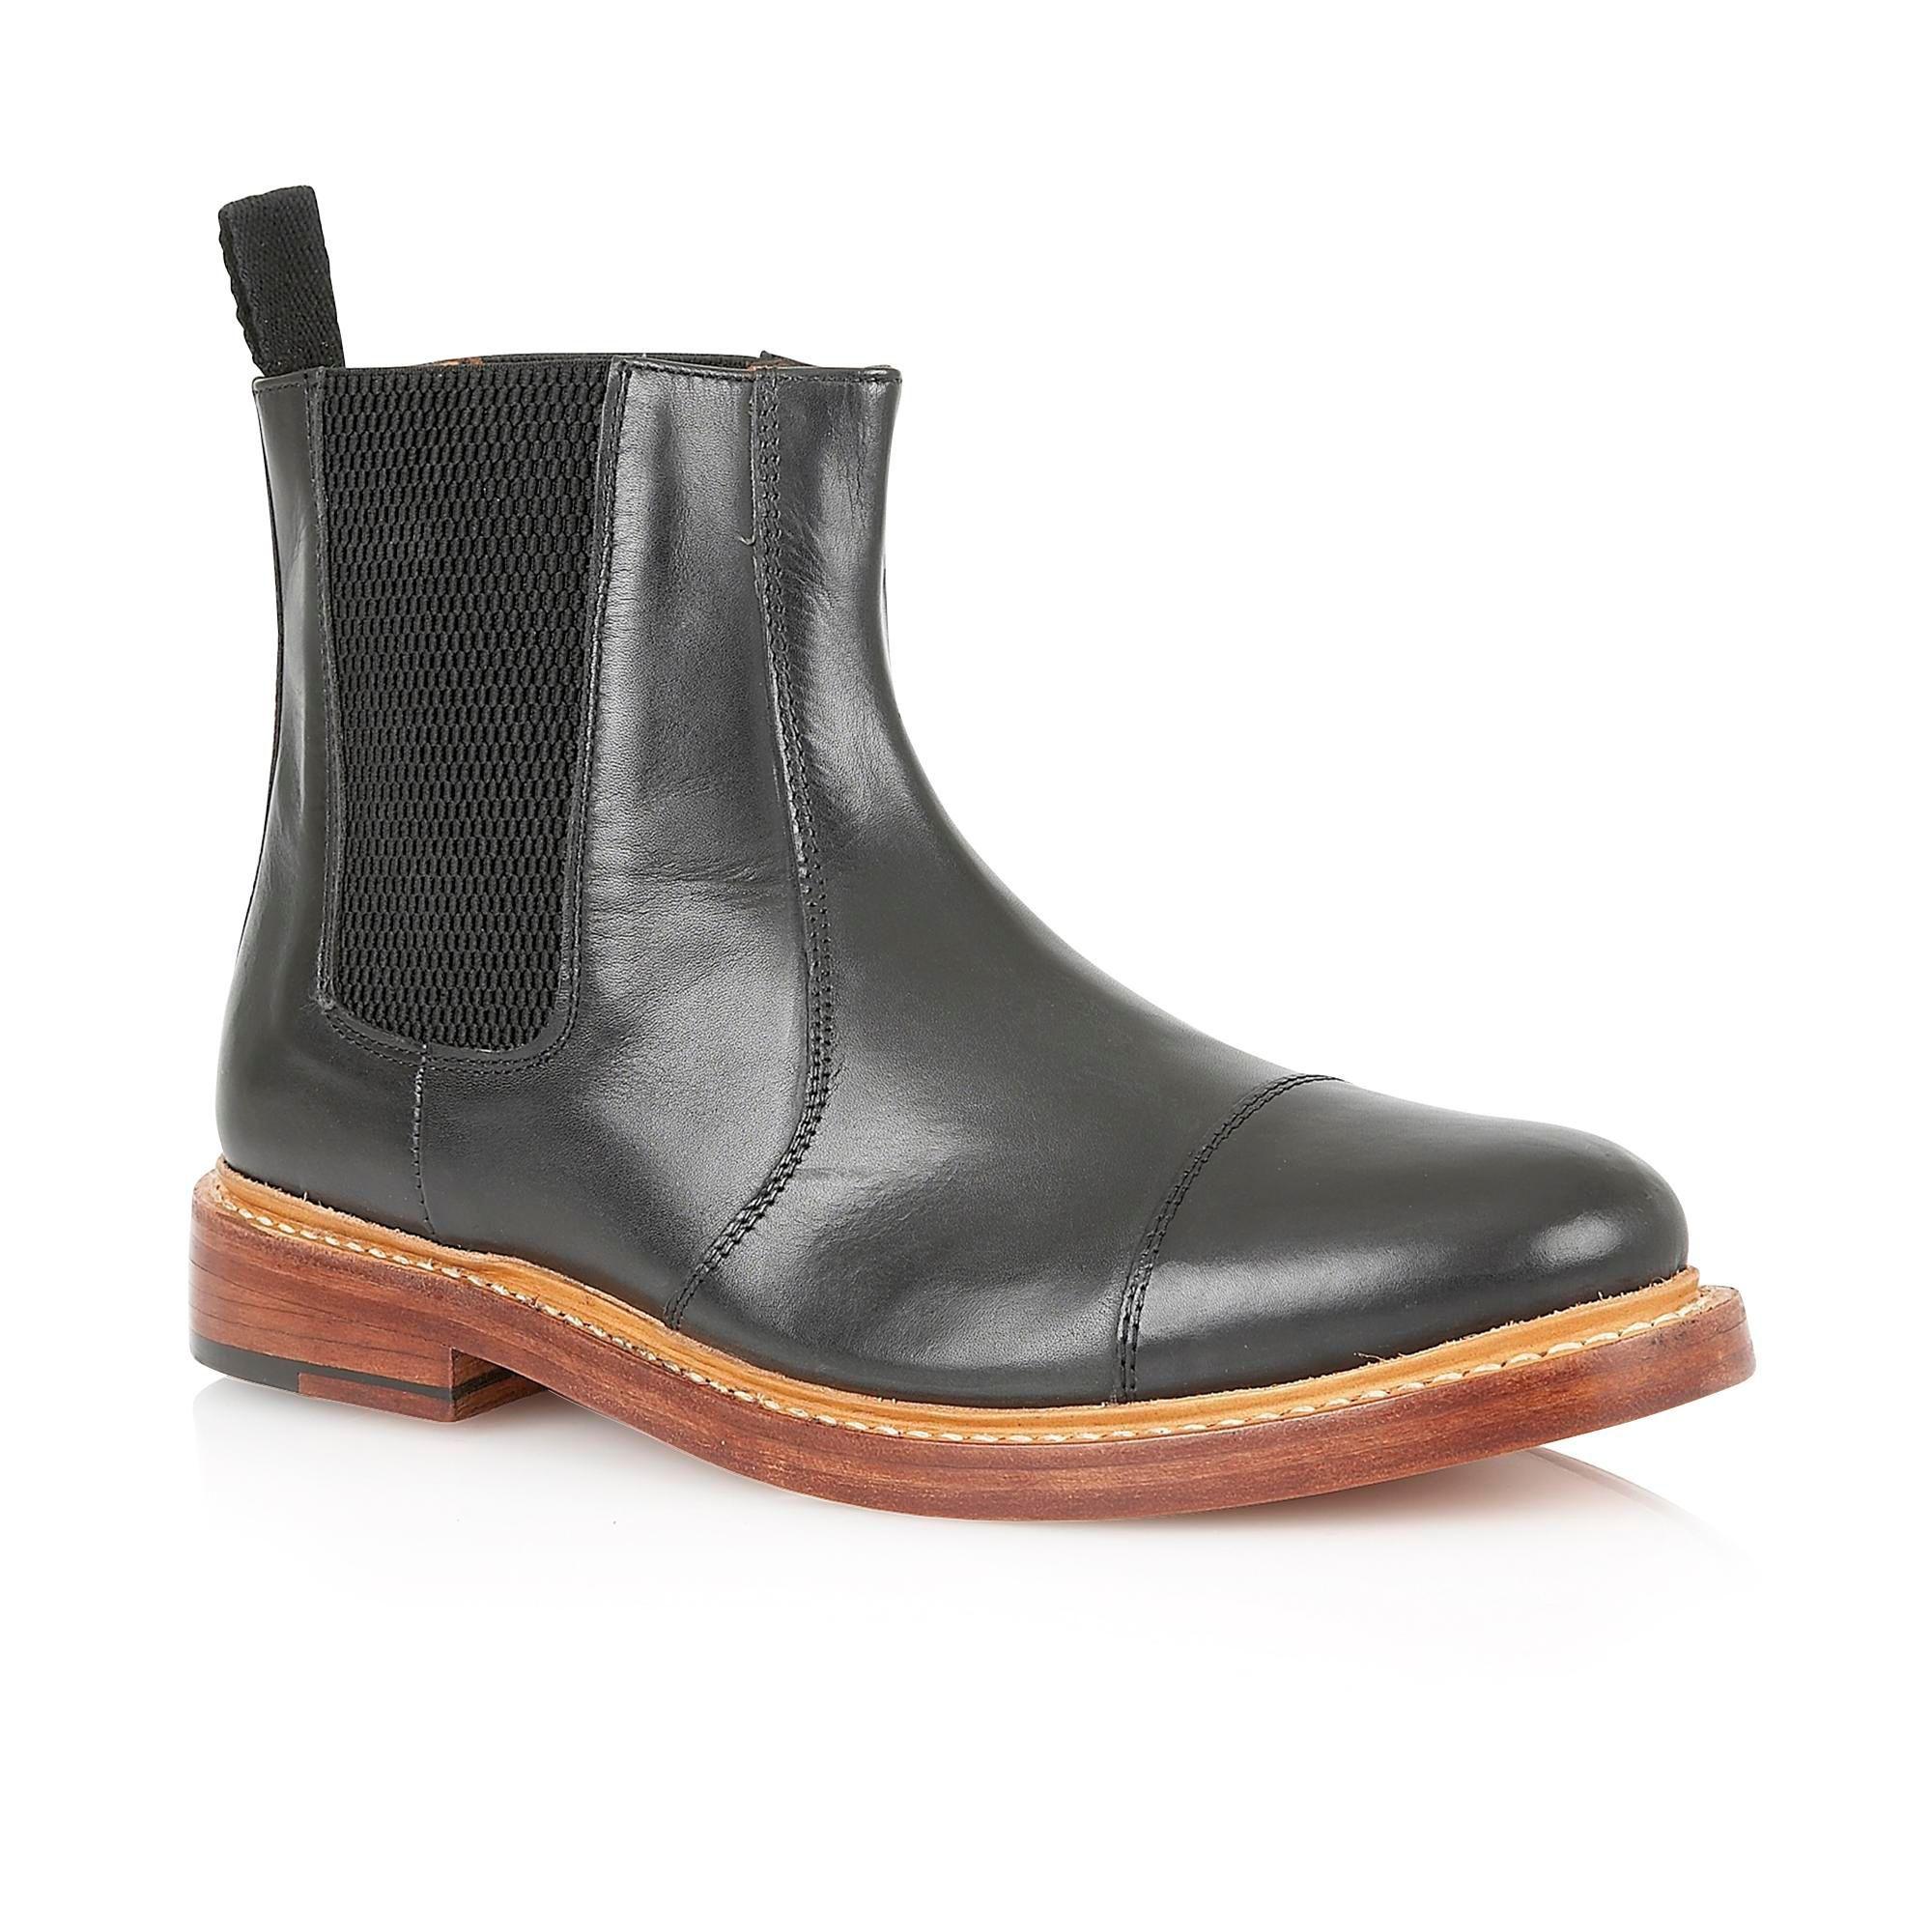 Lotus Lexton Slip On Casual Chelsea Boots, Black